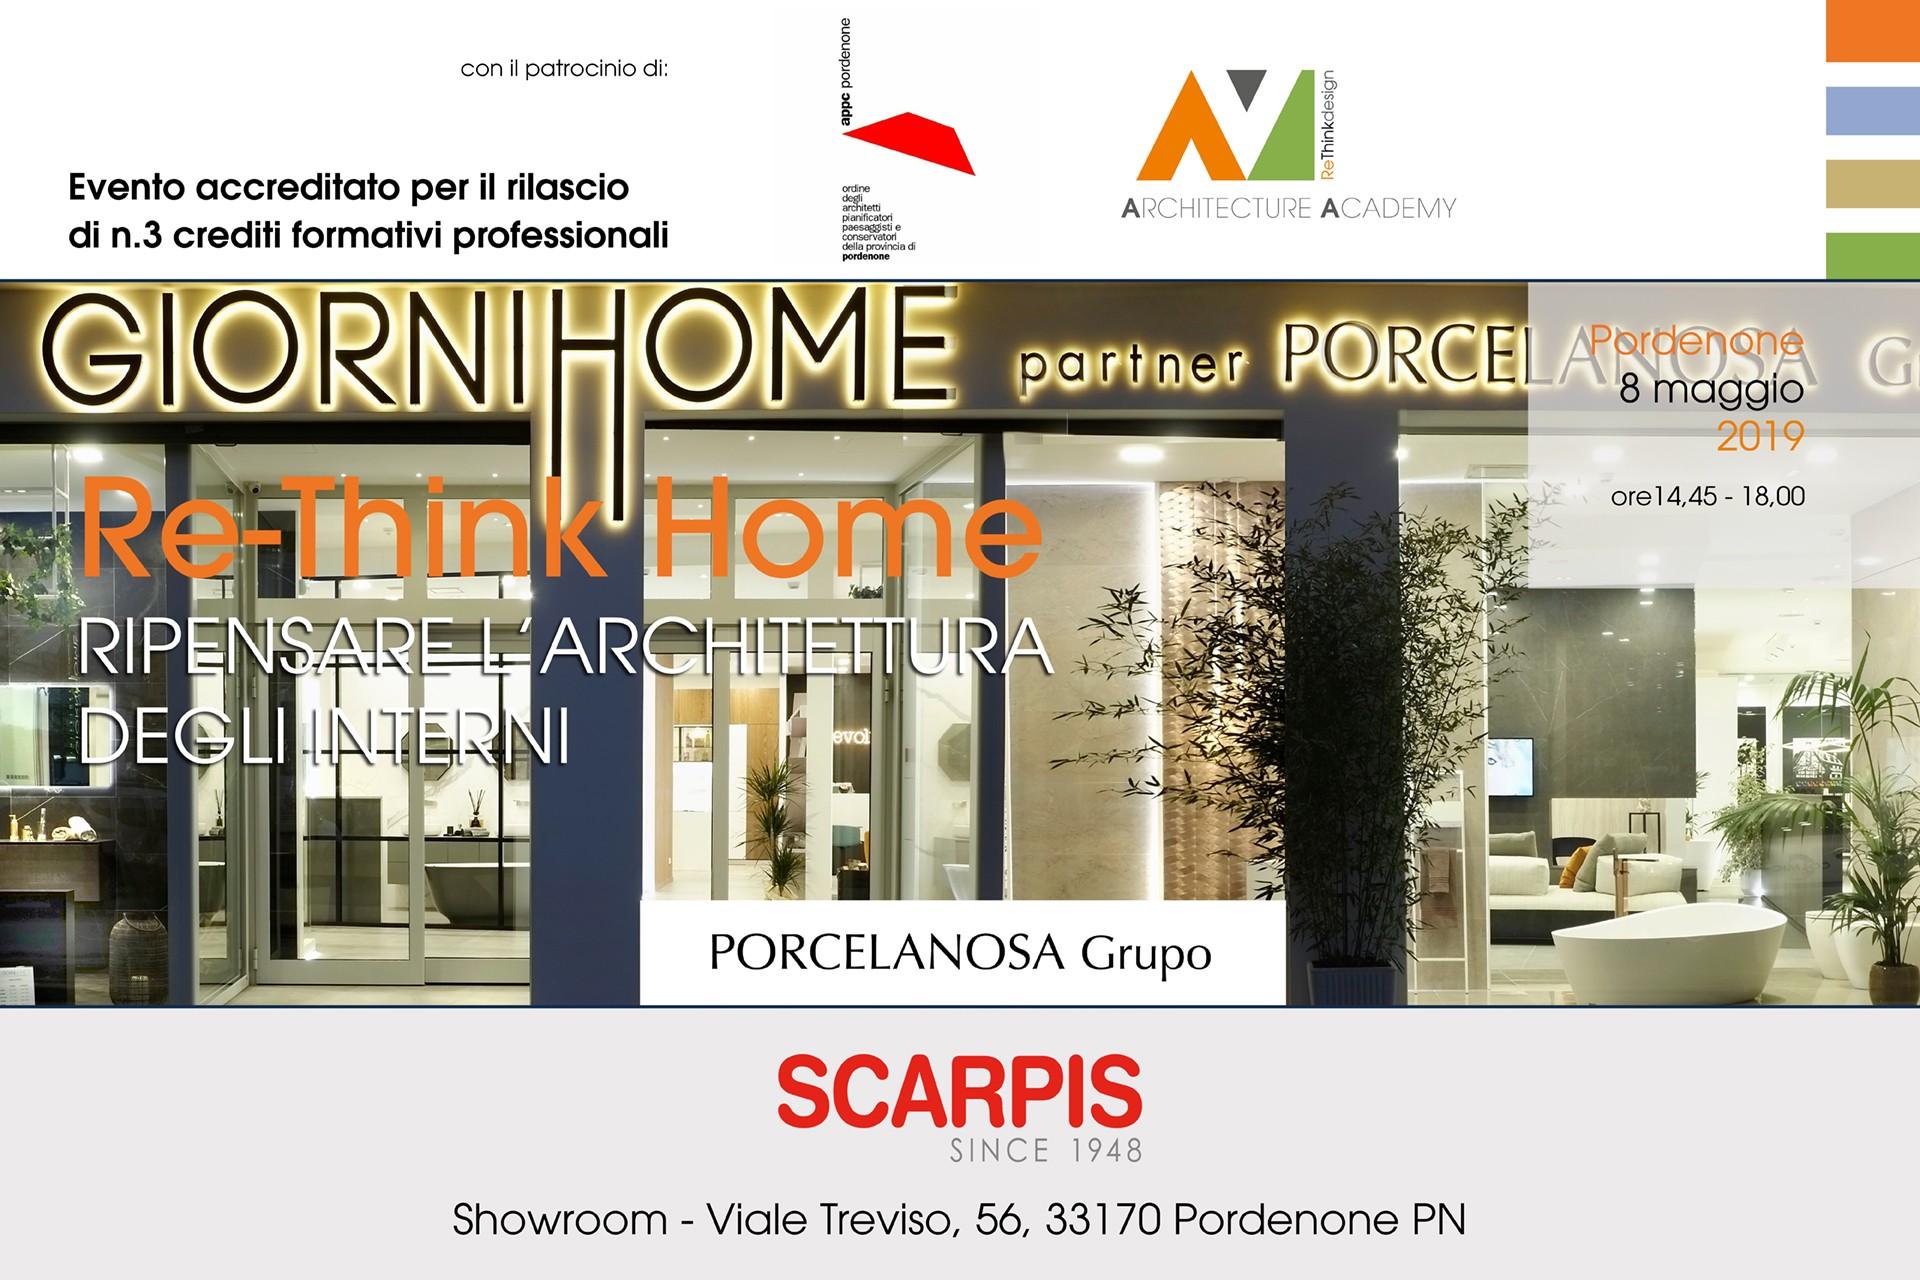 AA_Porcelanosa_2019_img-Architecture_Academy